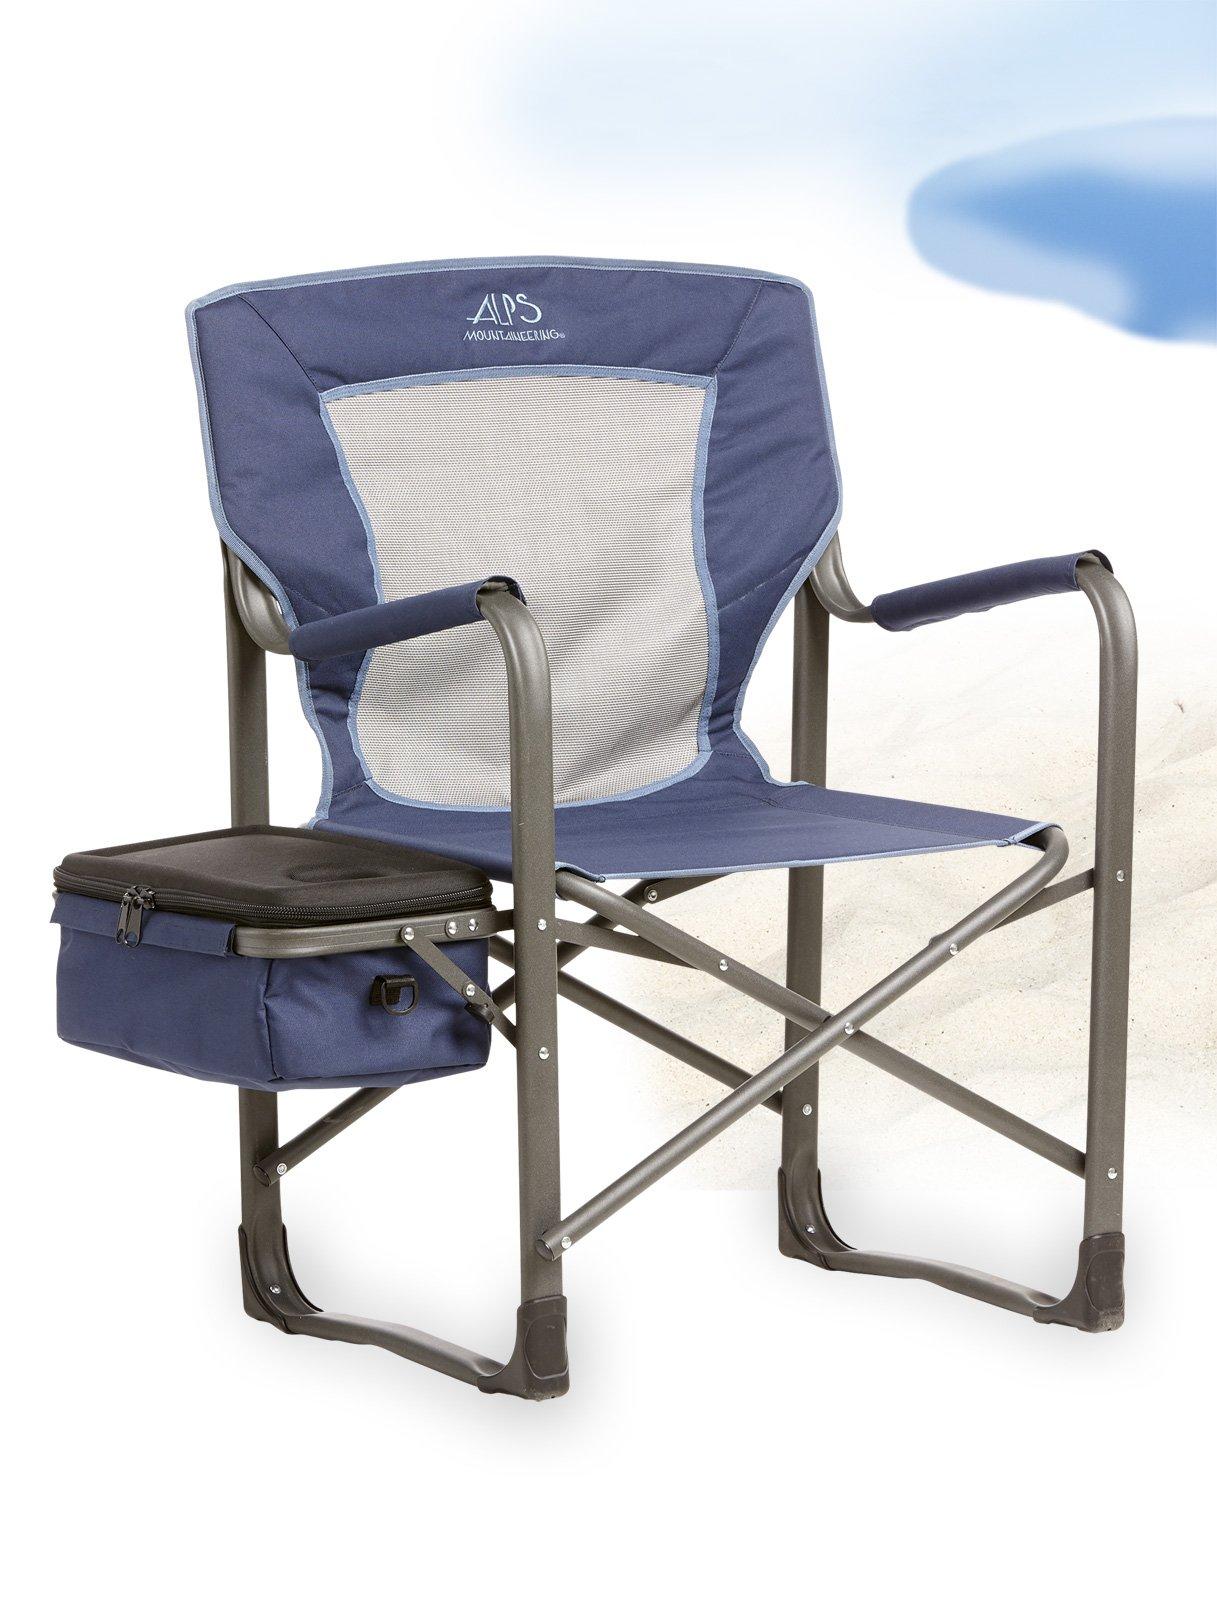 Alps Coastline Chair with Table (Blue)